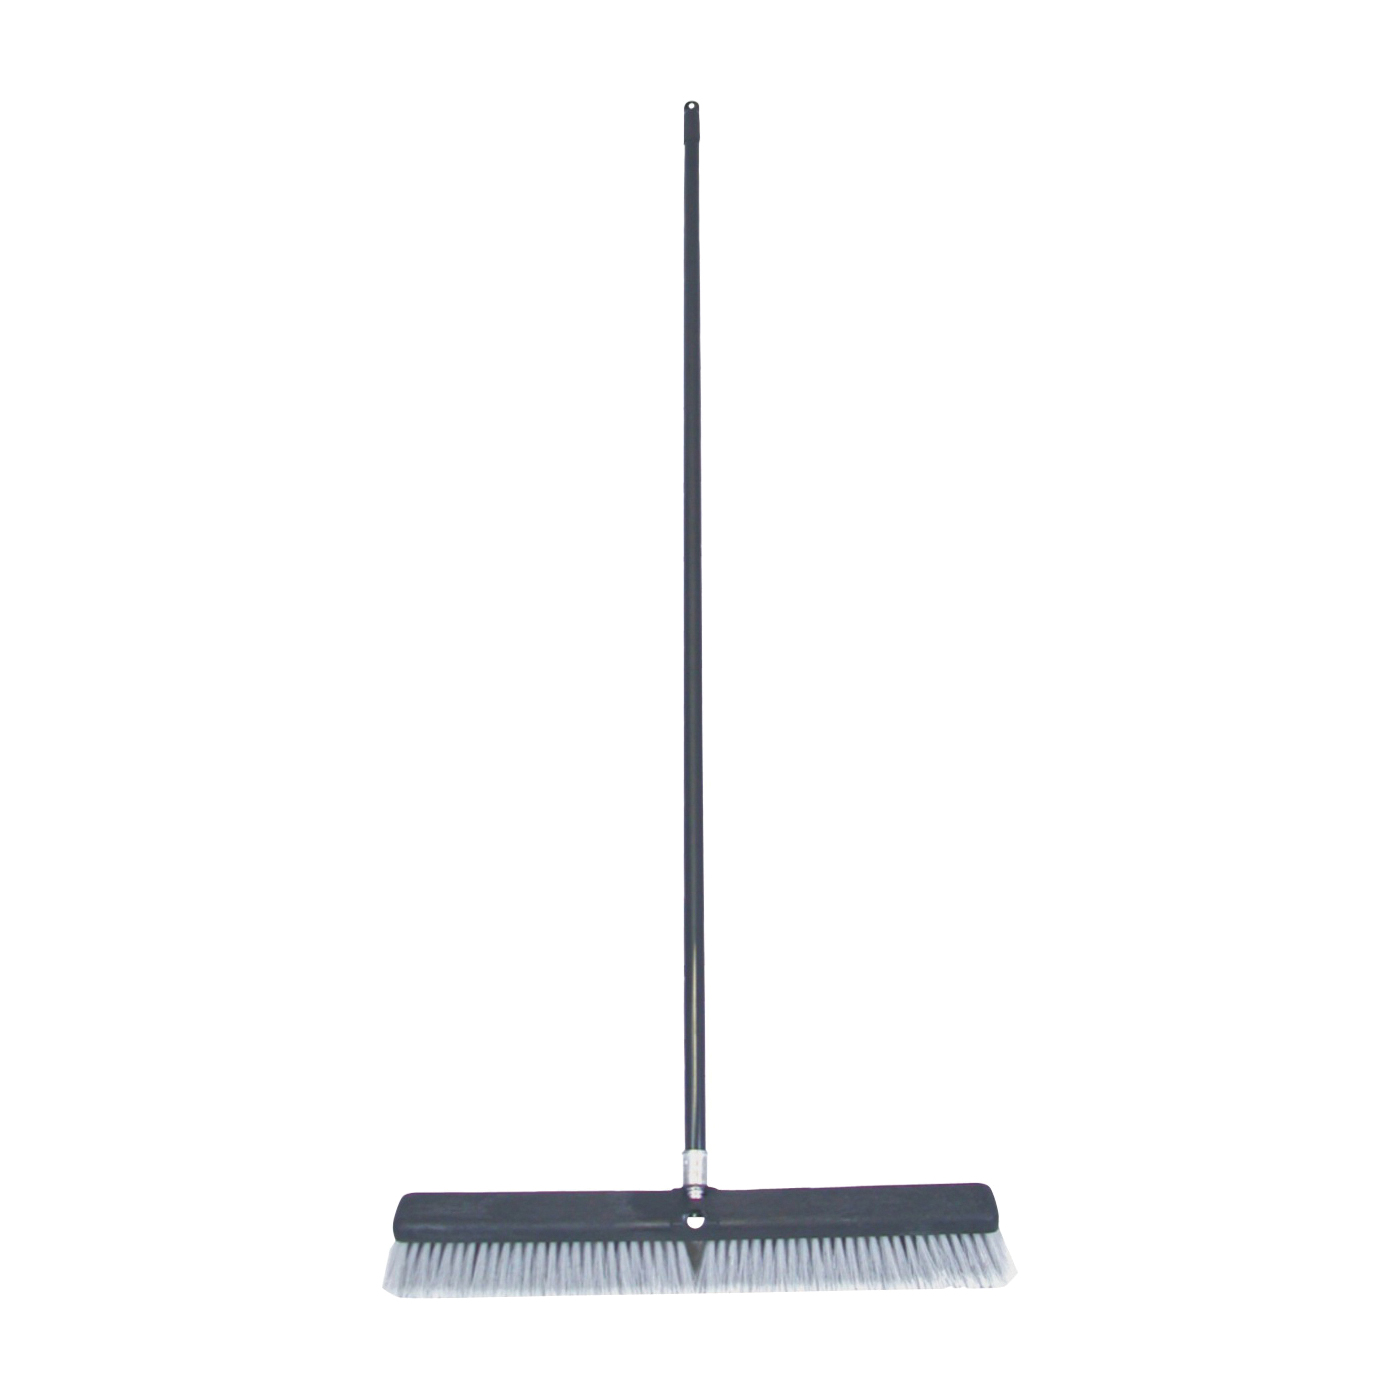 Picture of BIRDWELL 4025-4 Contractor Push Broom, 3 in L Trim, Polypropylene/Polystyrene Bristle